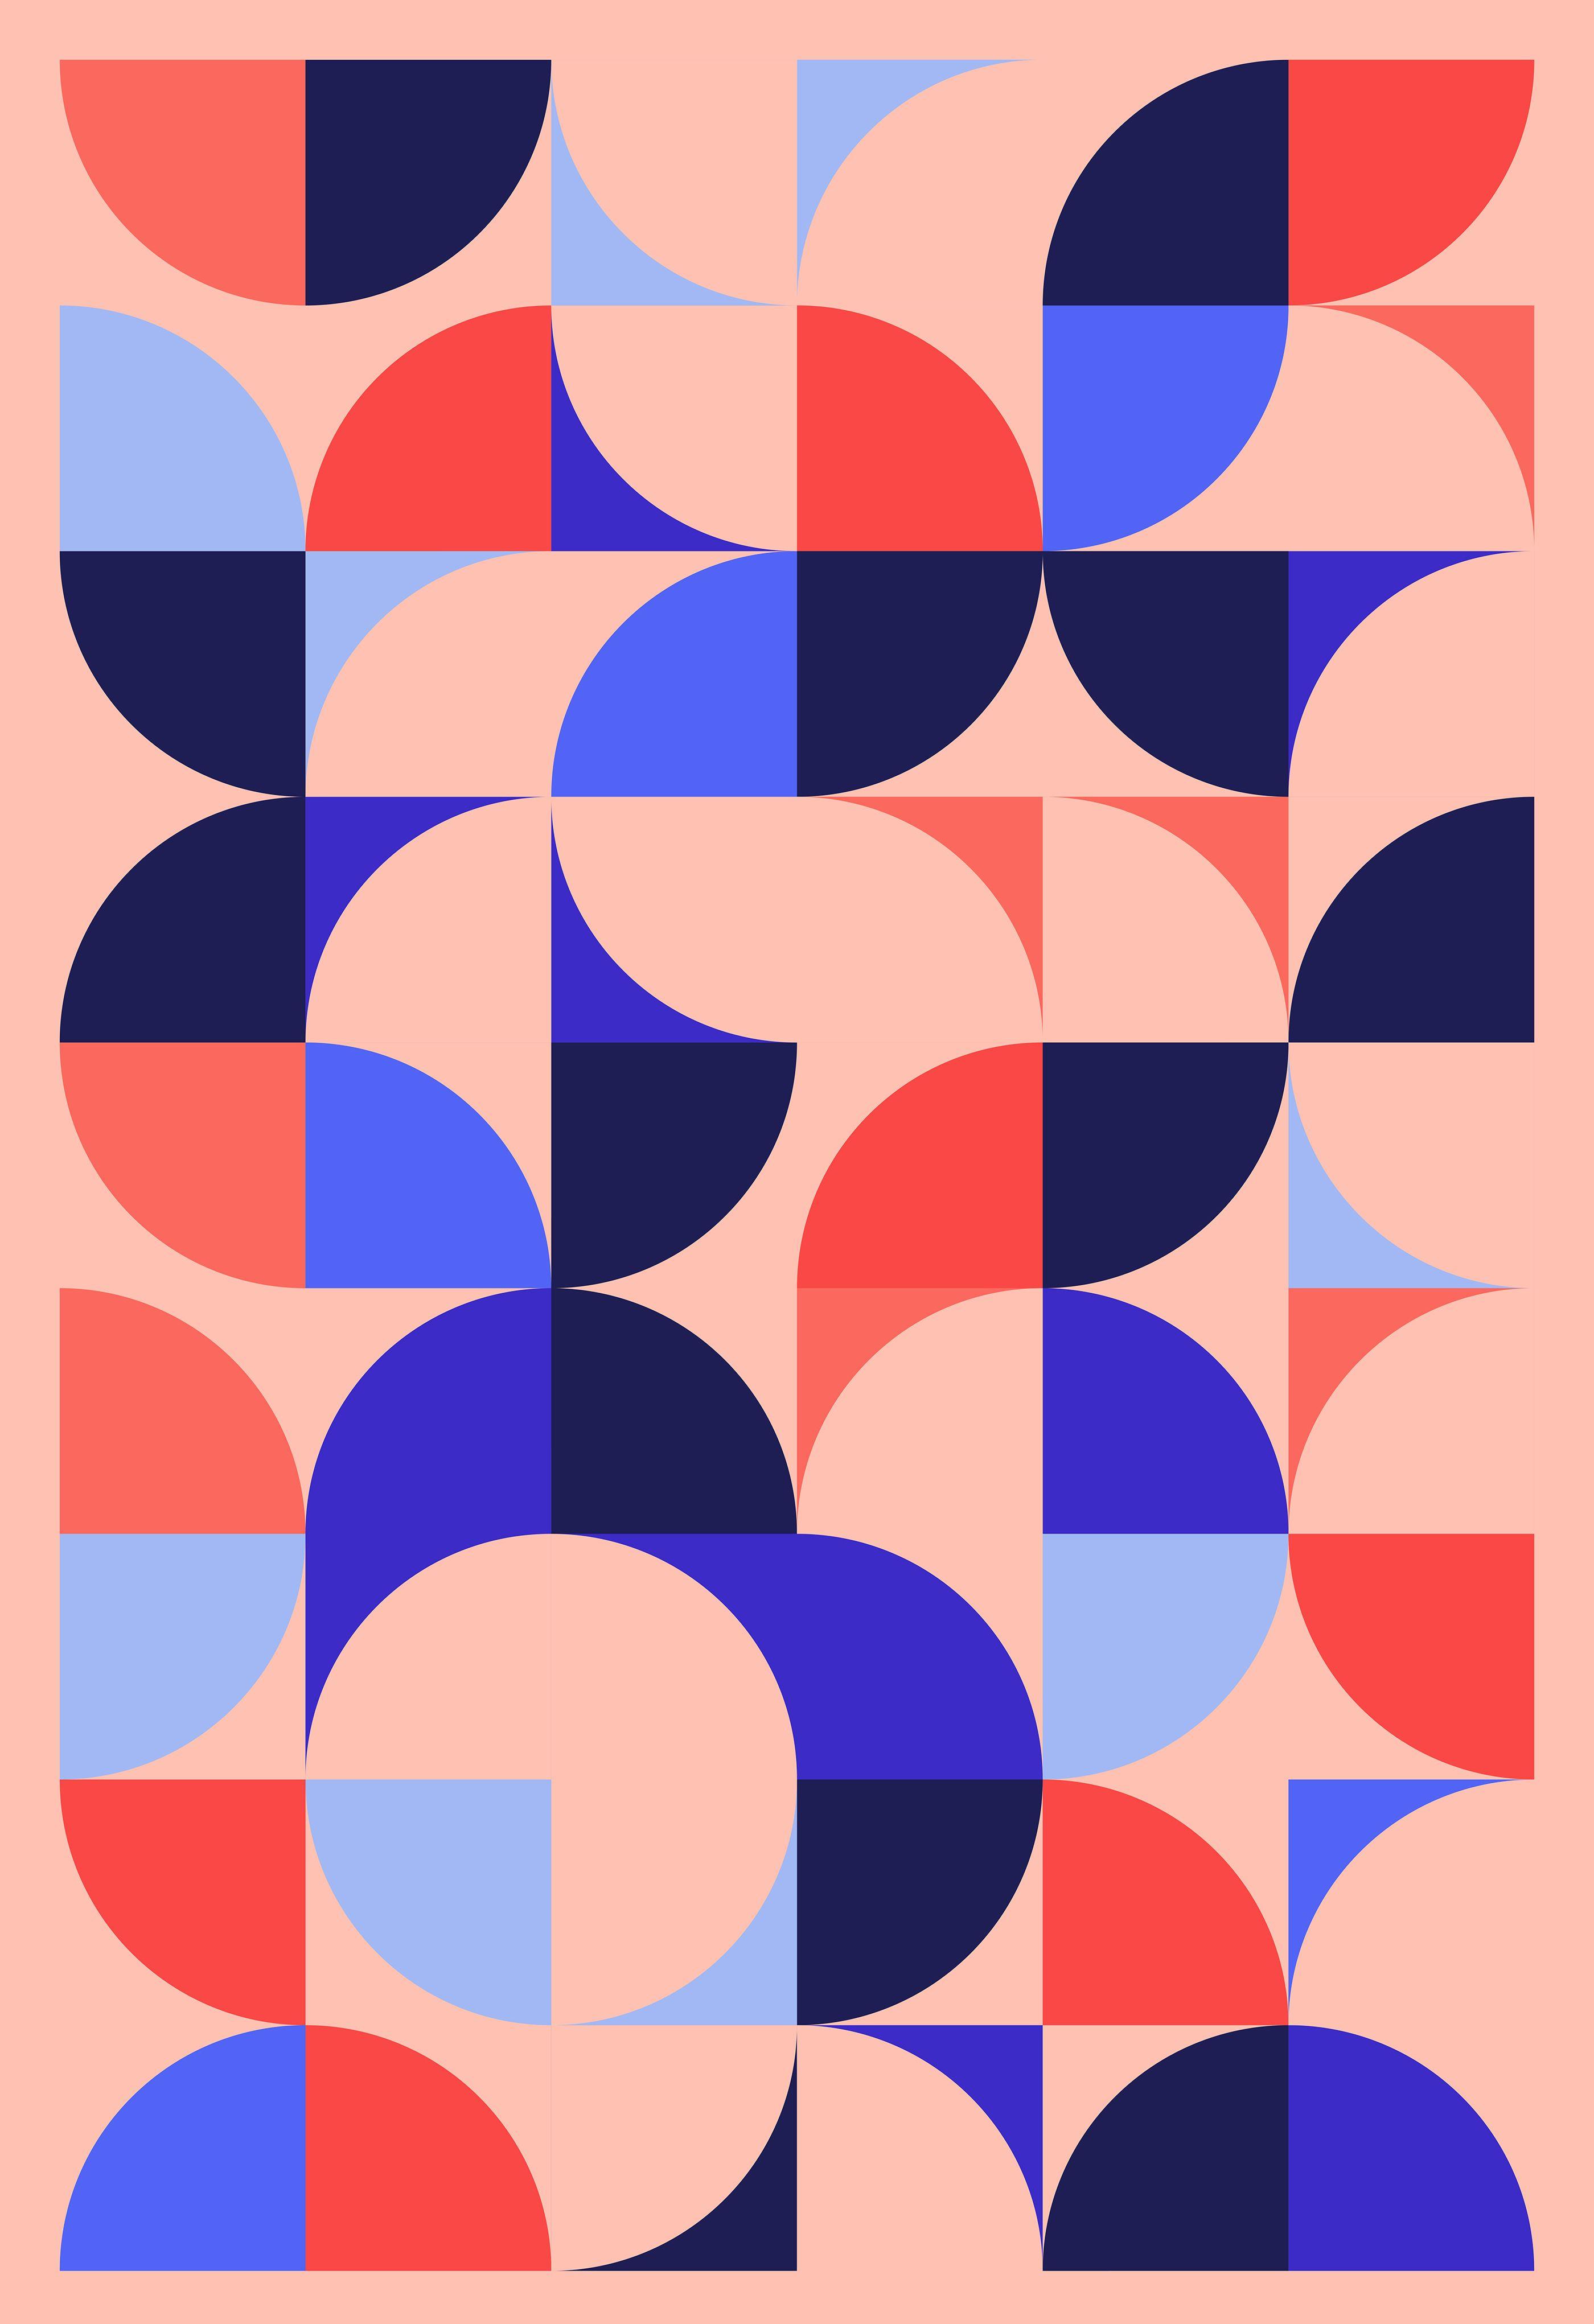 Geometric Design Series 5 On Behance Basic Shapes Design